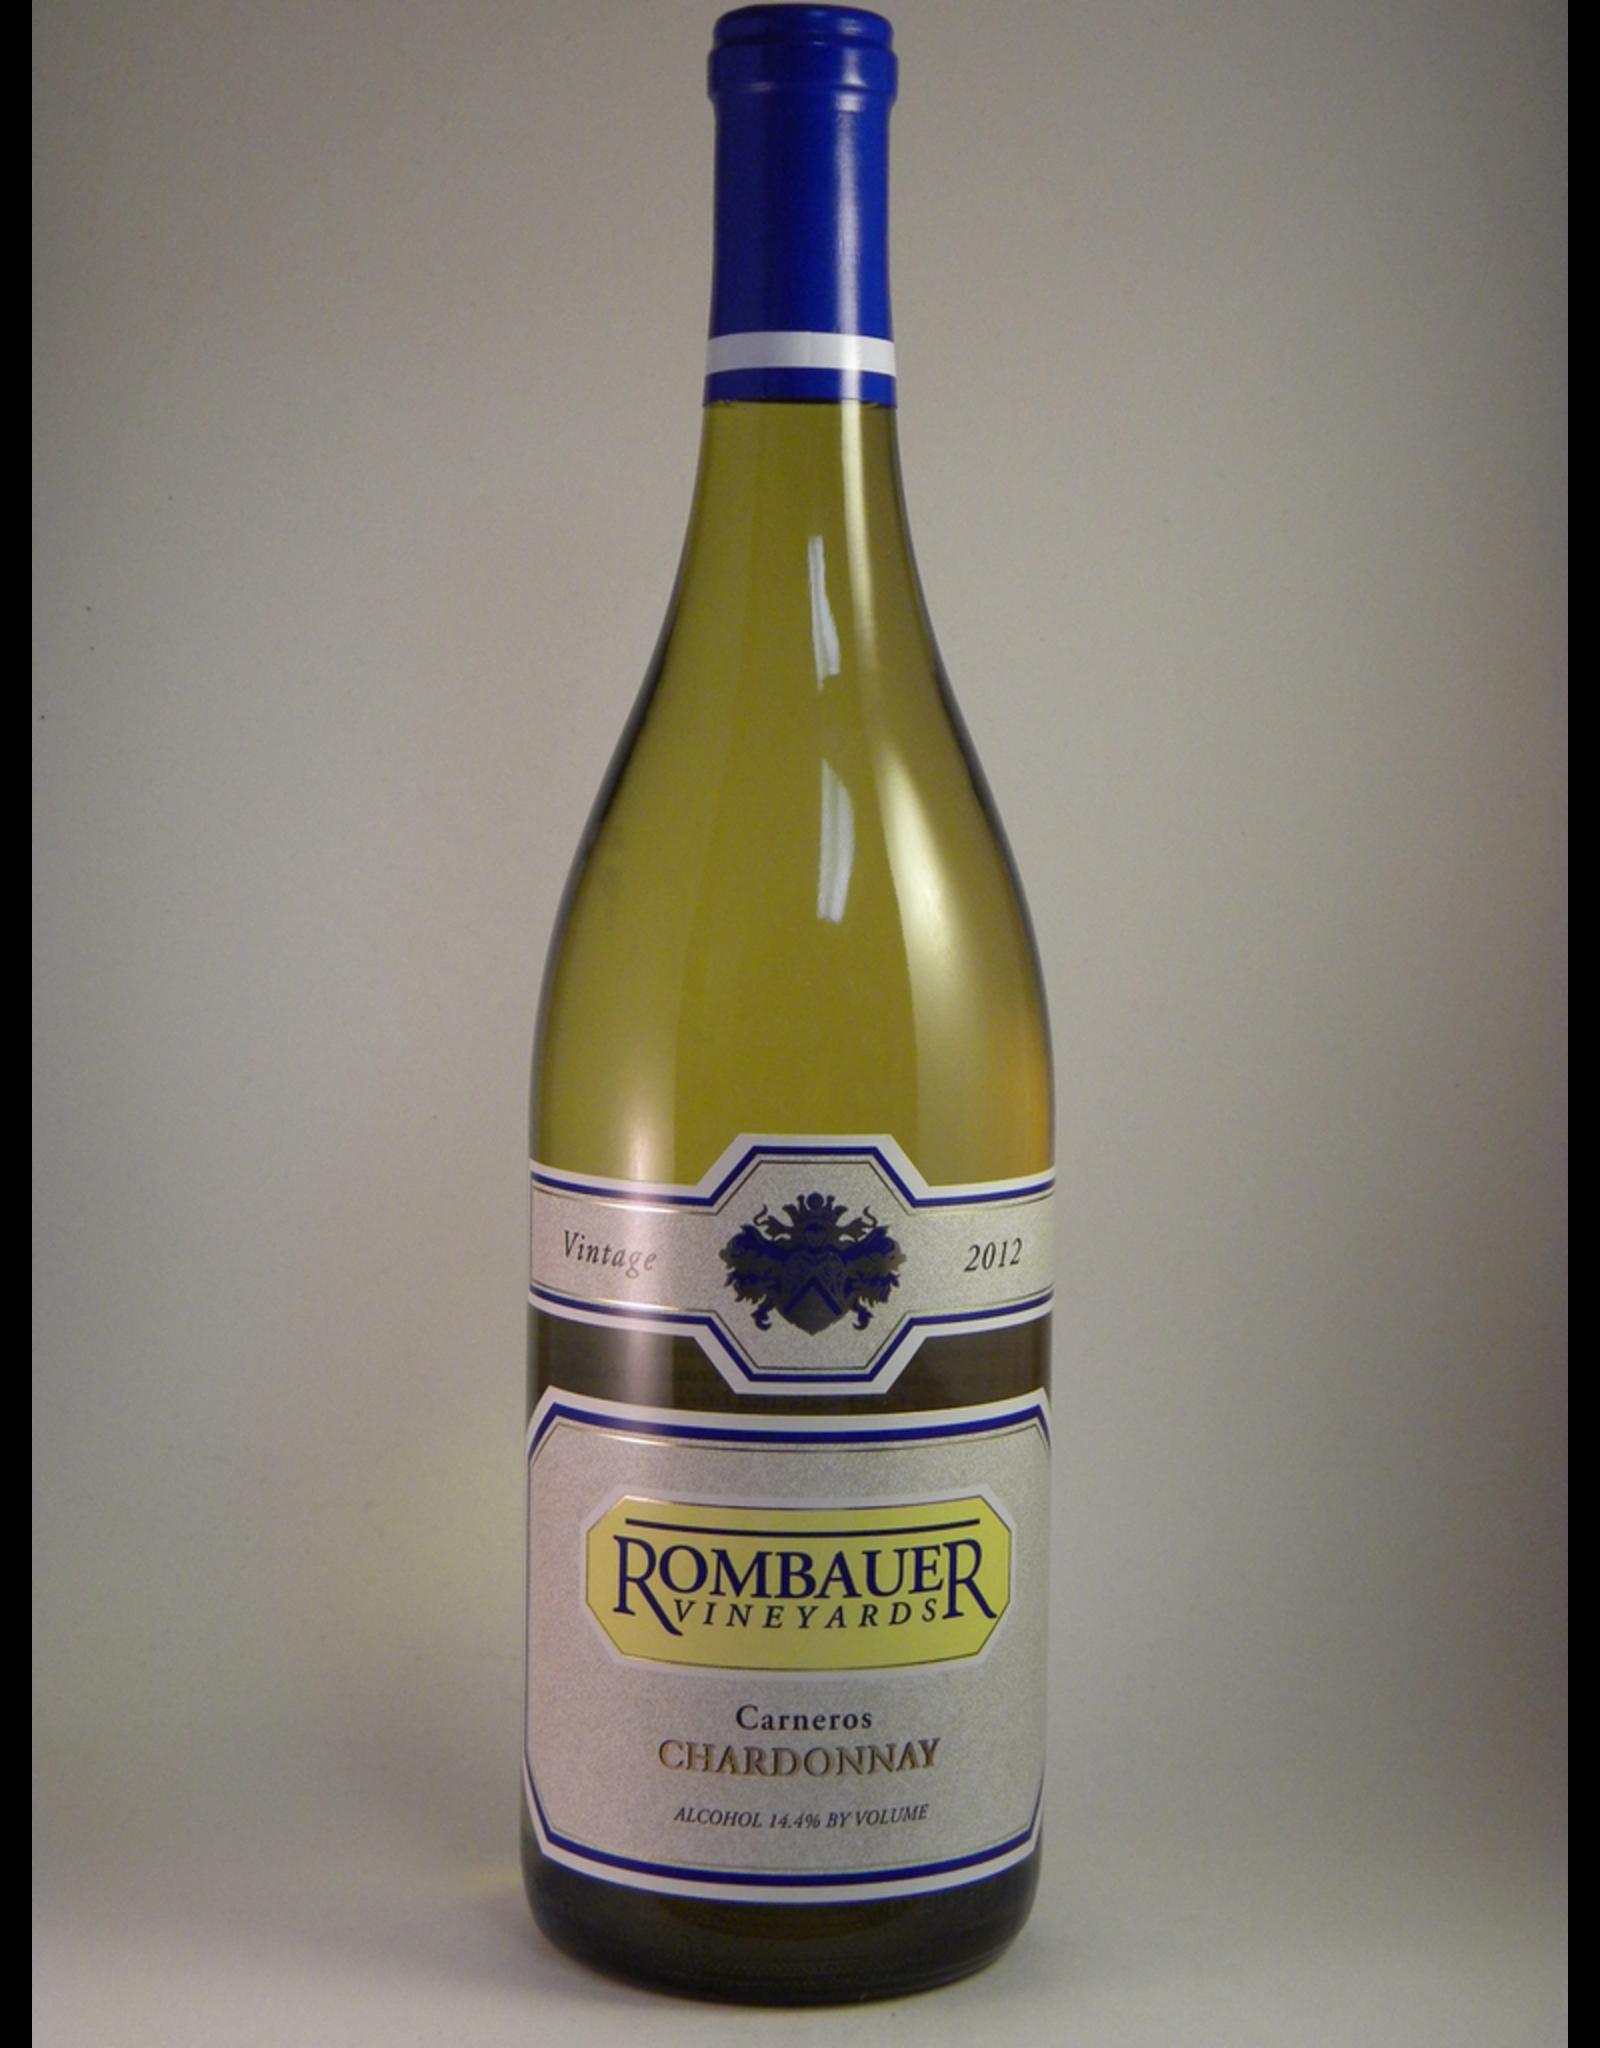 Rombauer Rombauer Chardonnay Carneros 2019